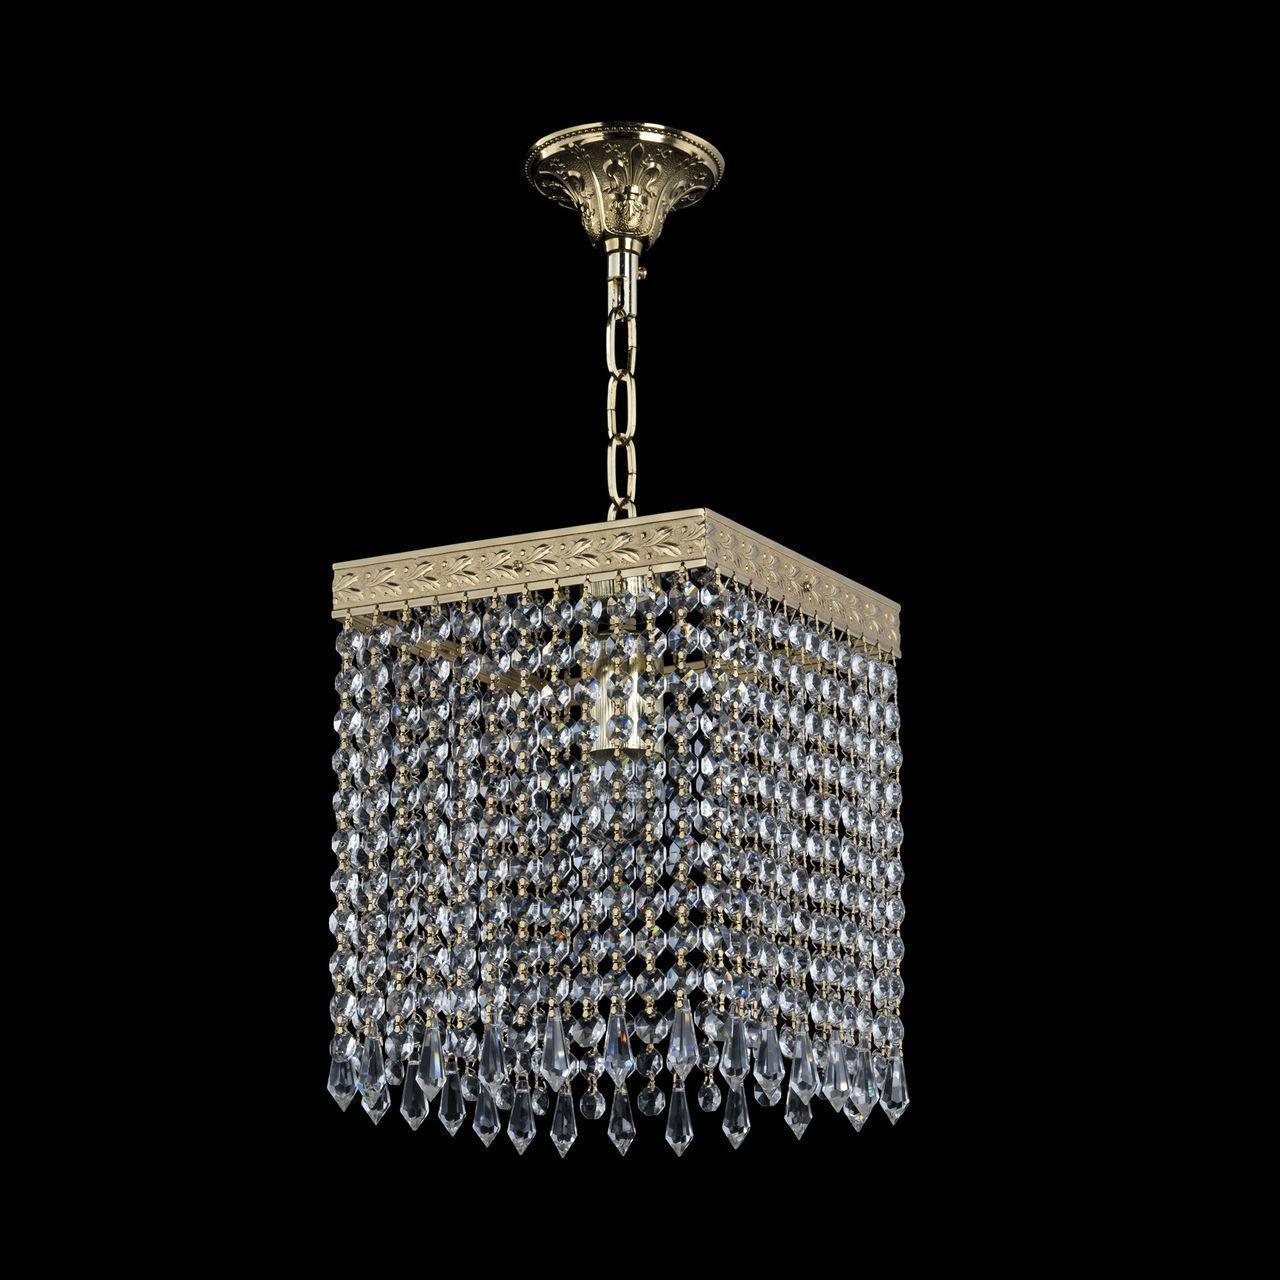 Подвесной светильник Bohemia Ivele 19202/20IV G Drops